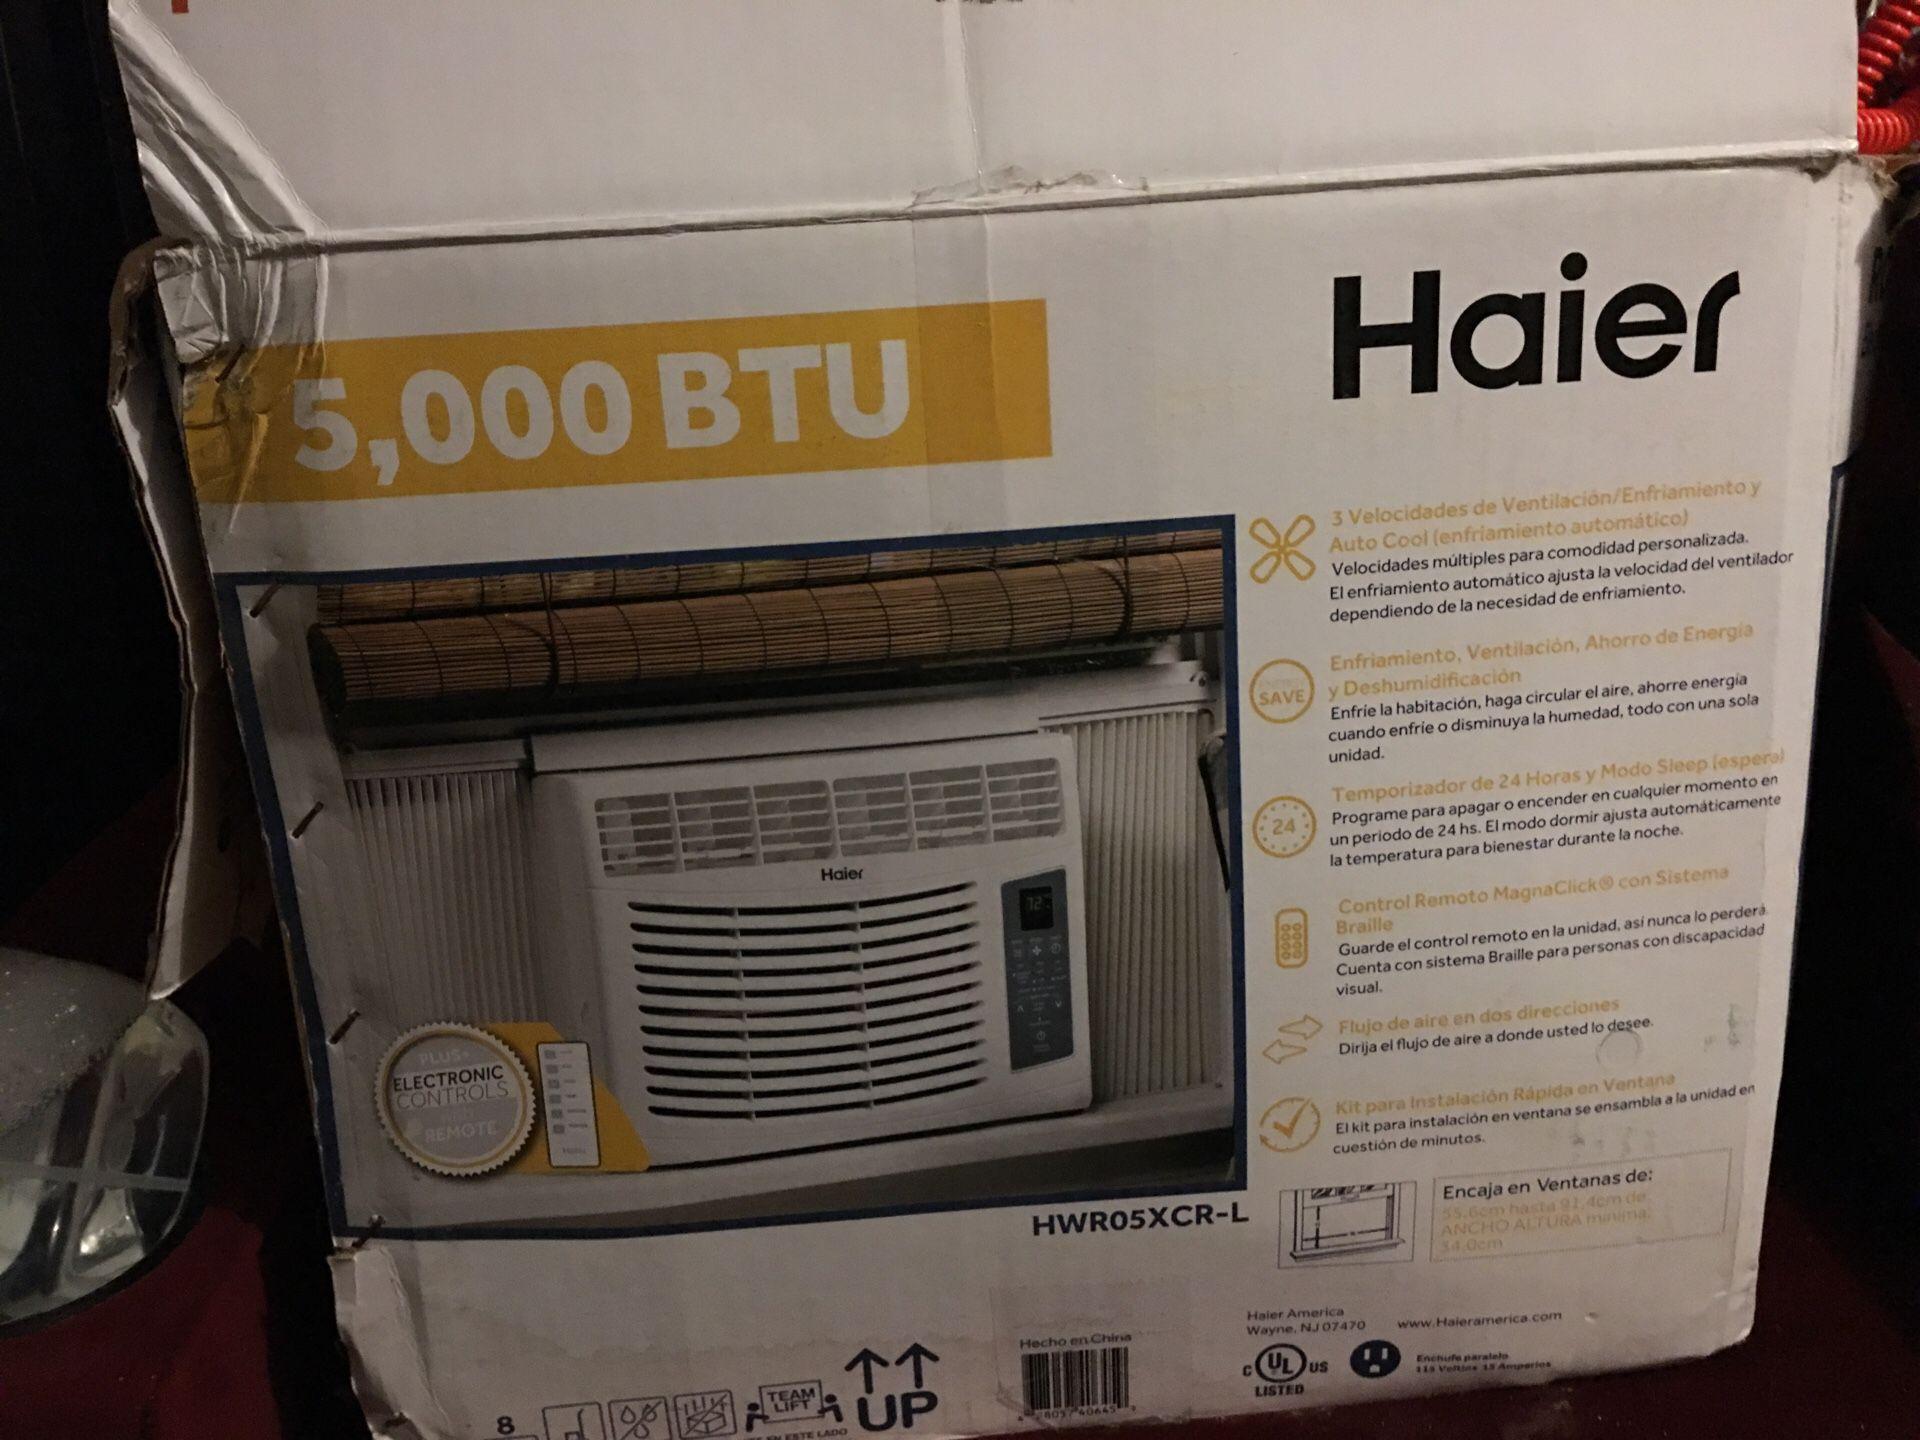 Window AC (Haier)